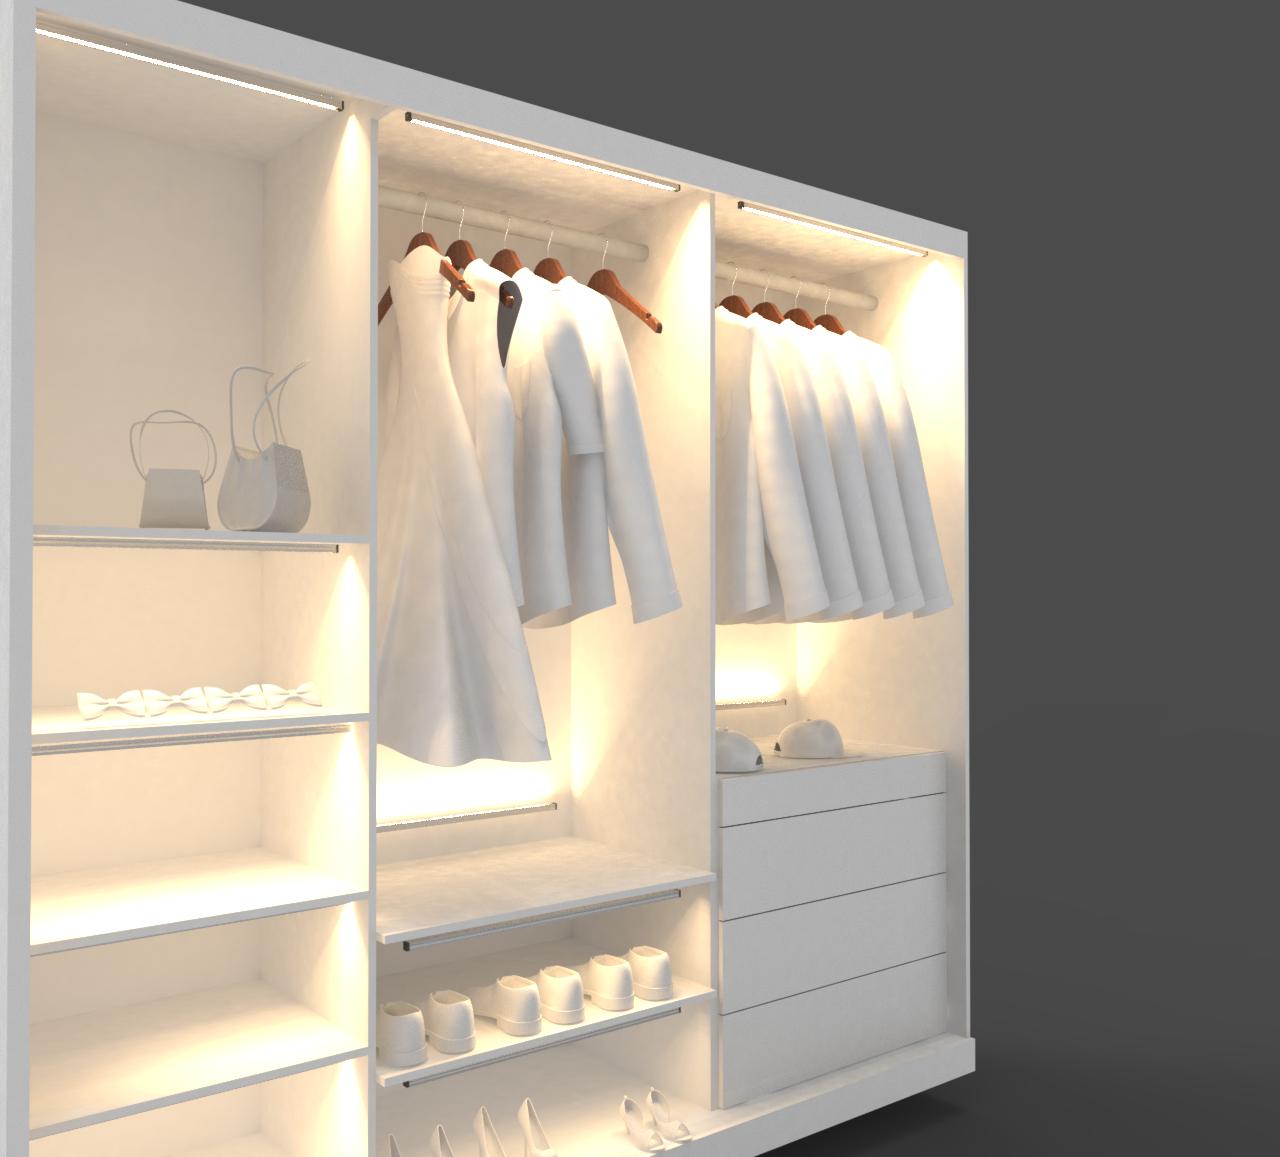 Closet lighting idea.  Closet lighting, Closet designs, Wardrobe